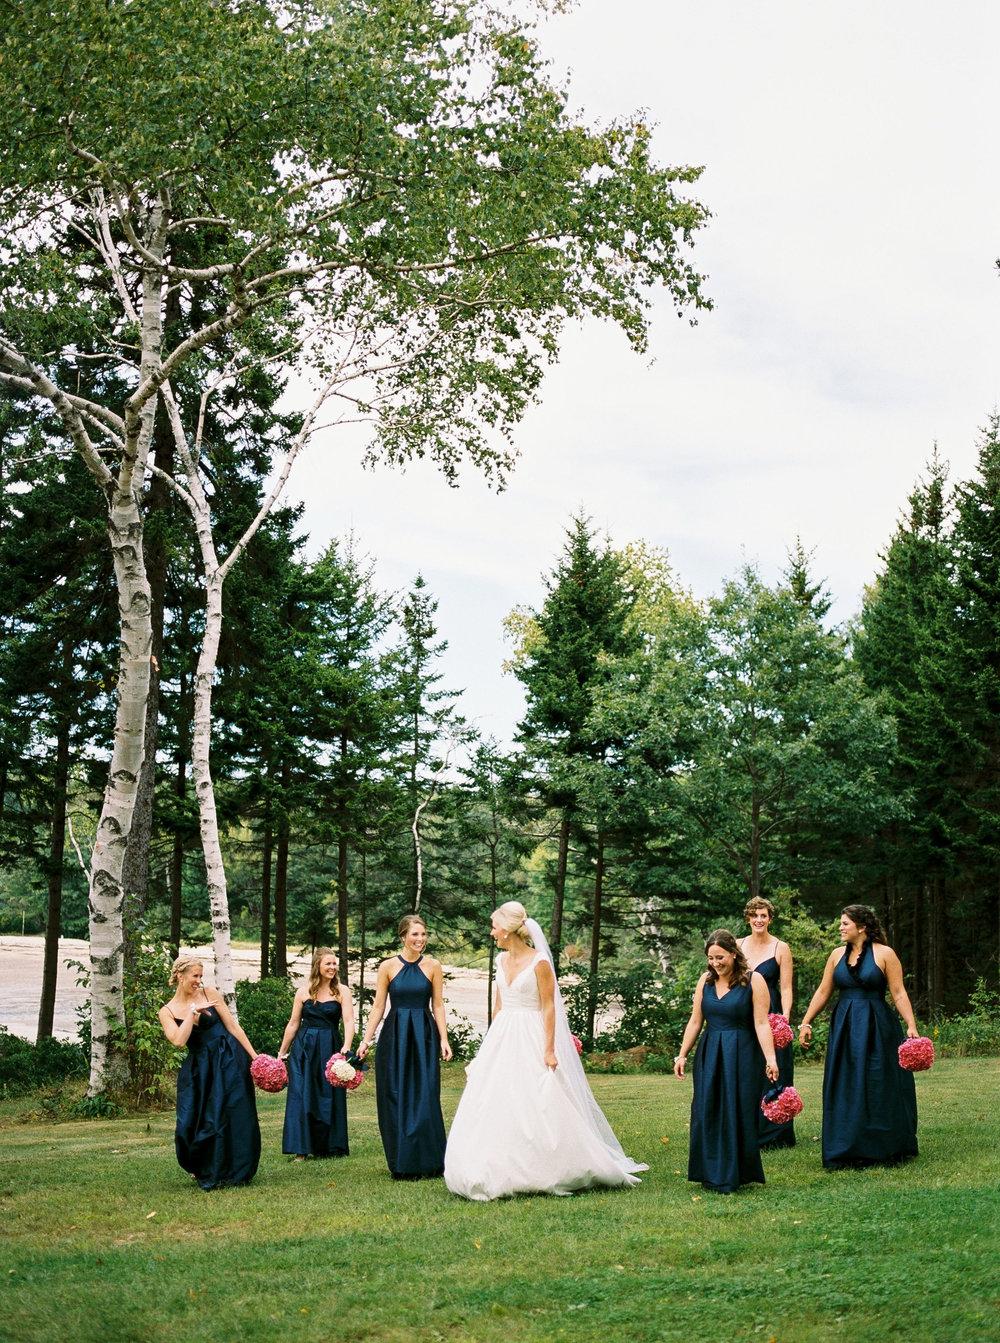 Alexandra-Elise-Photography-Ali-Reed-Chebeague-Island-Maine-Elizabeth-Josh-Wedding-Party-028.jpg